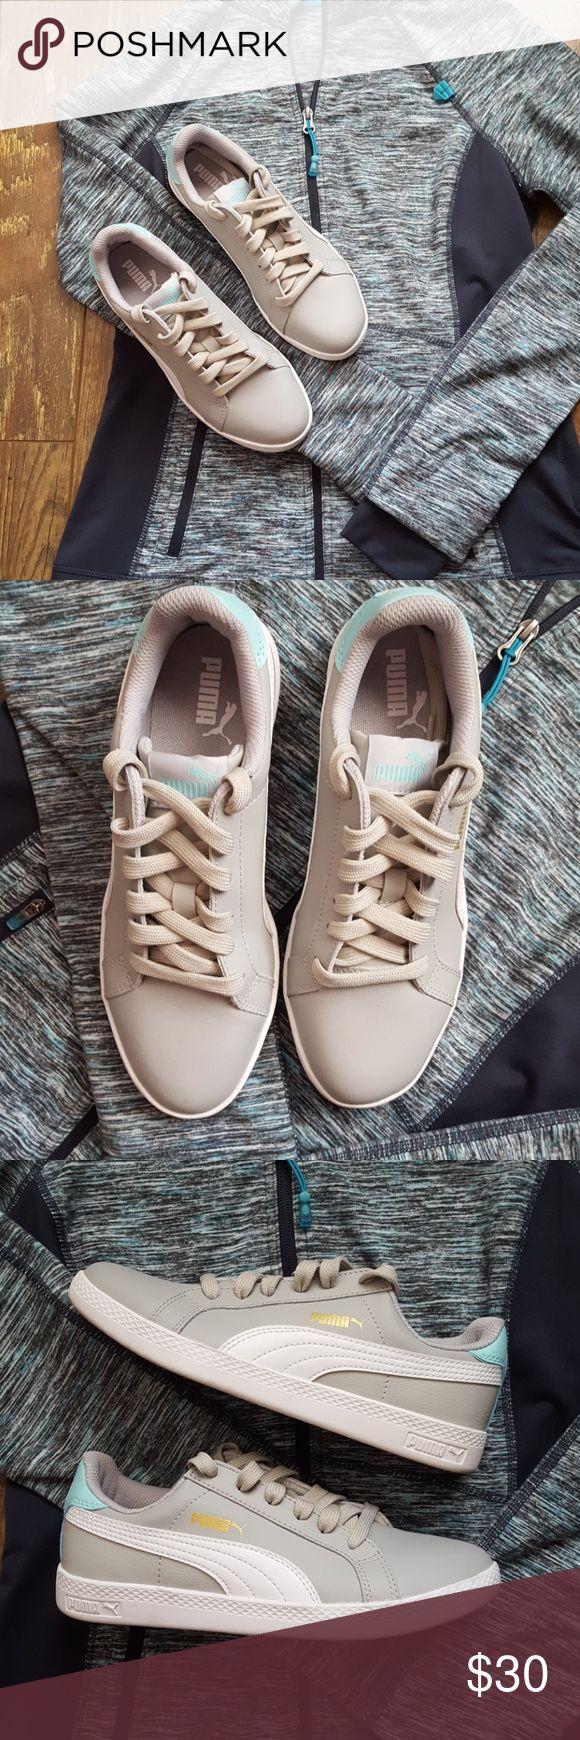 BRAND NEW PUMA BRAND NEW PUMA  SIZE 6 NEVER WORN NO TAGS Puma Shoes Sneakers